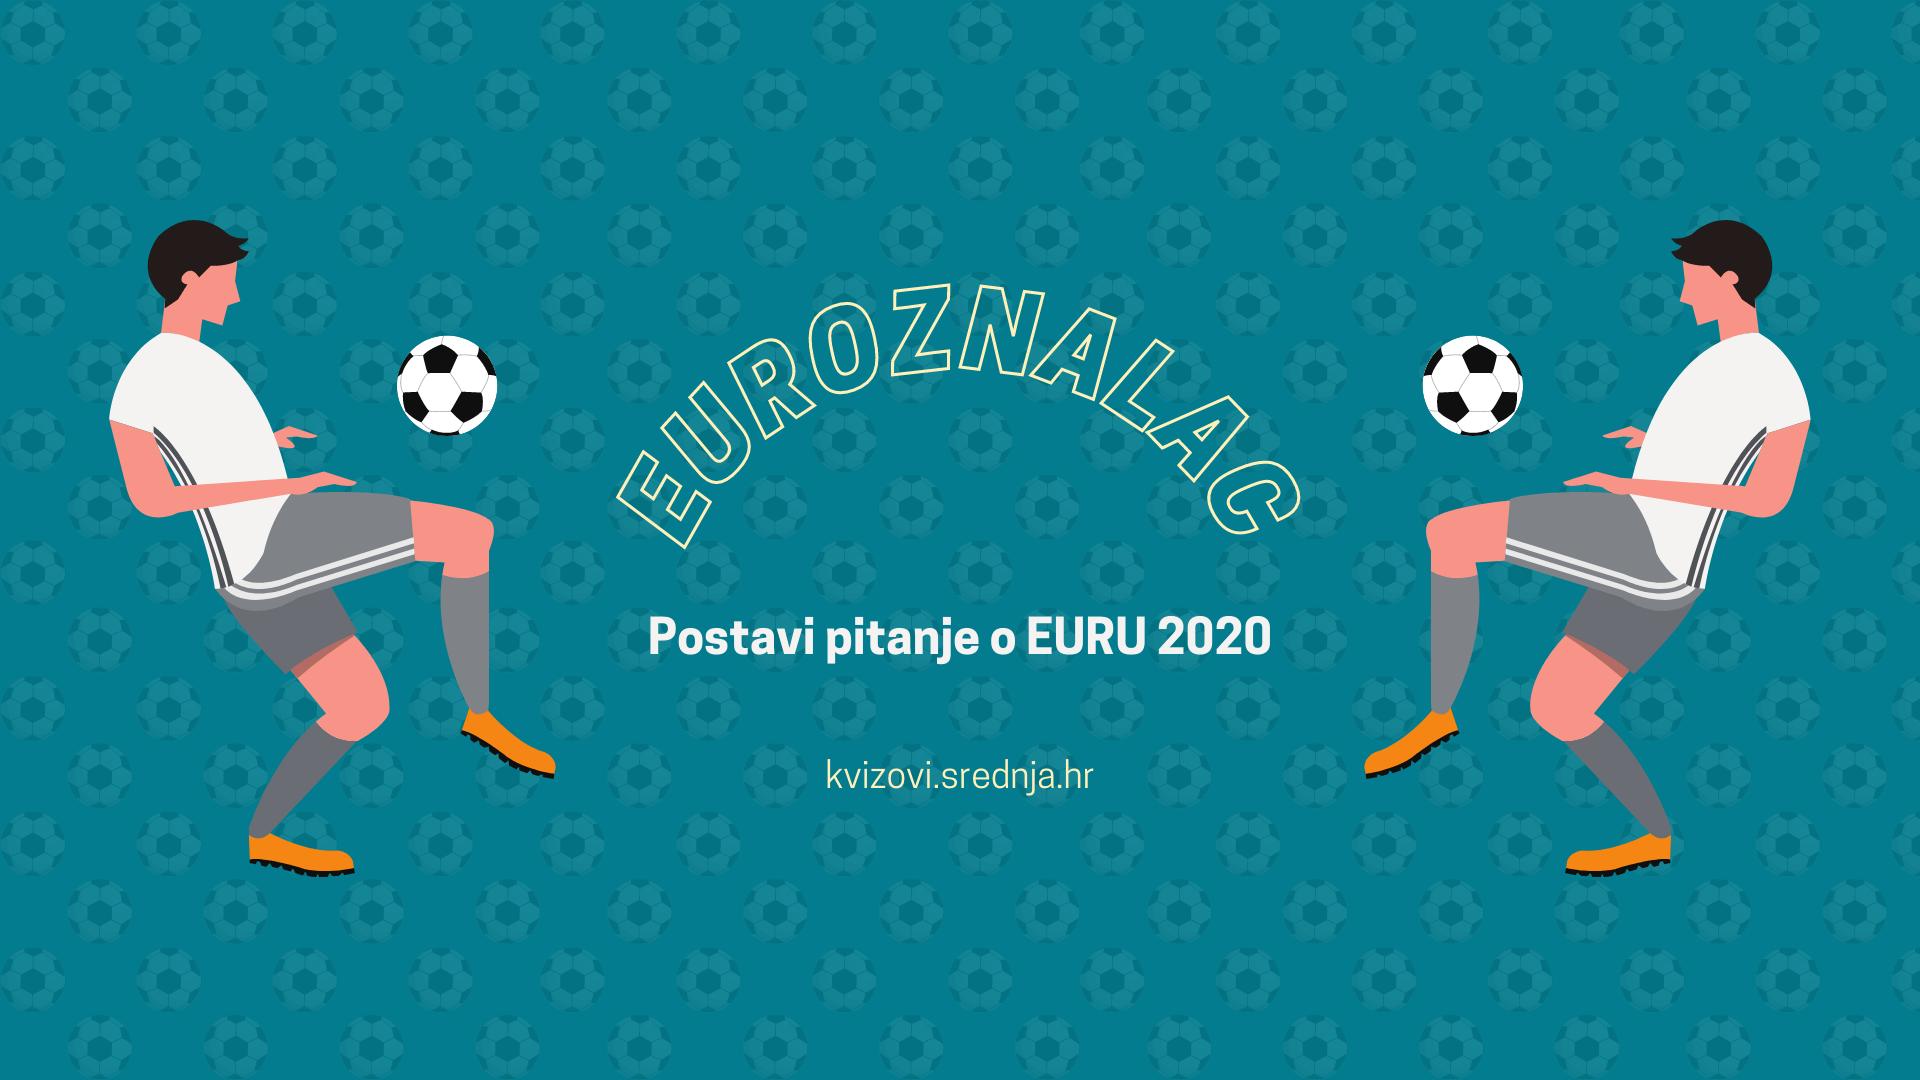 euroznalac